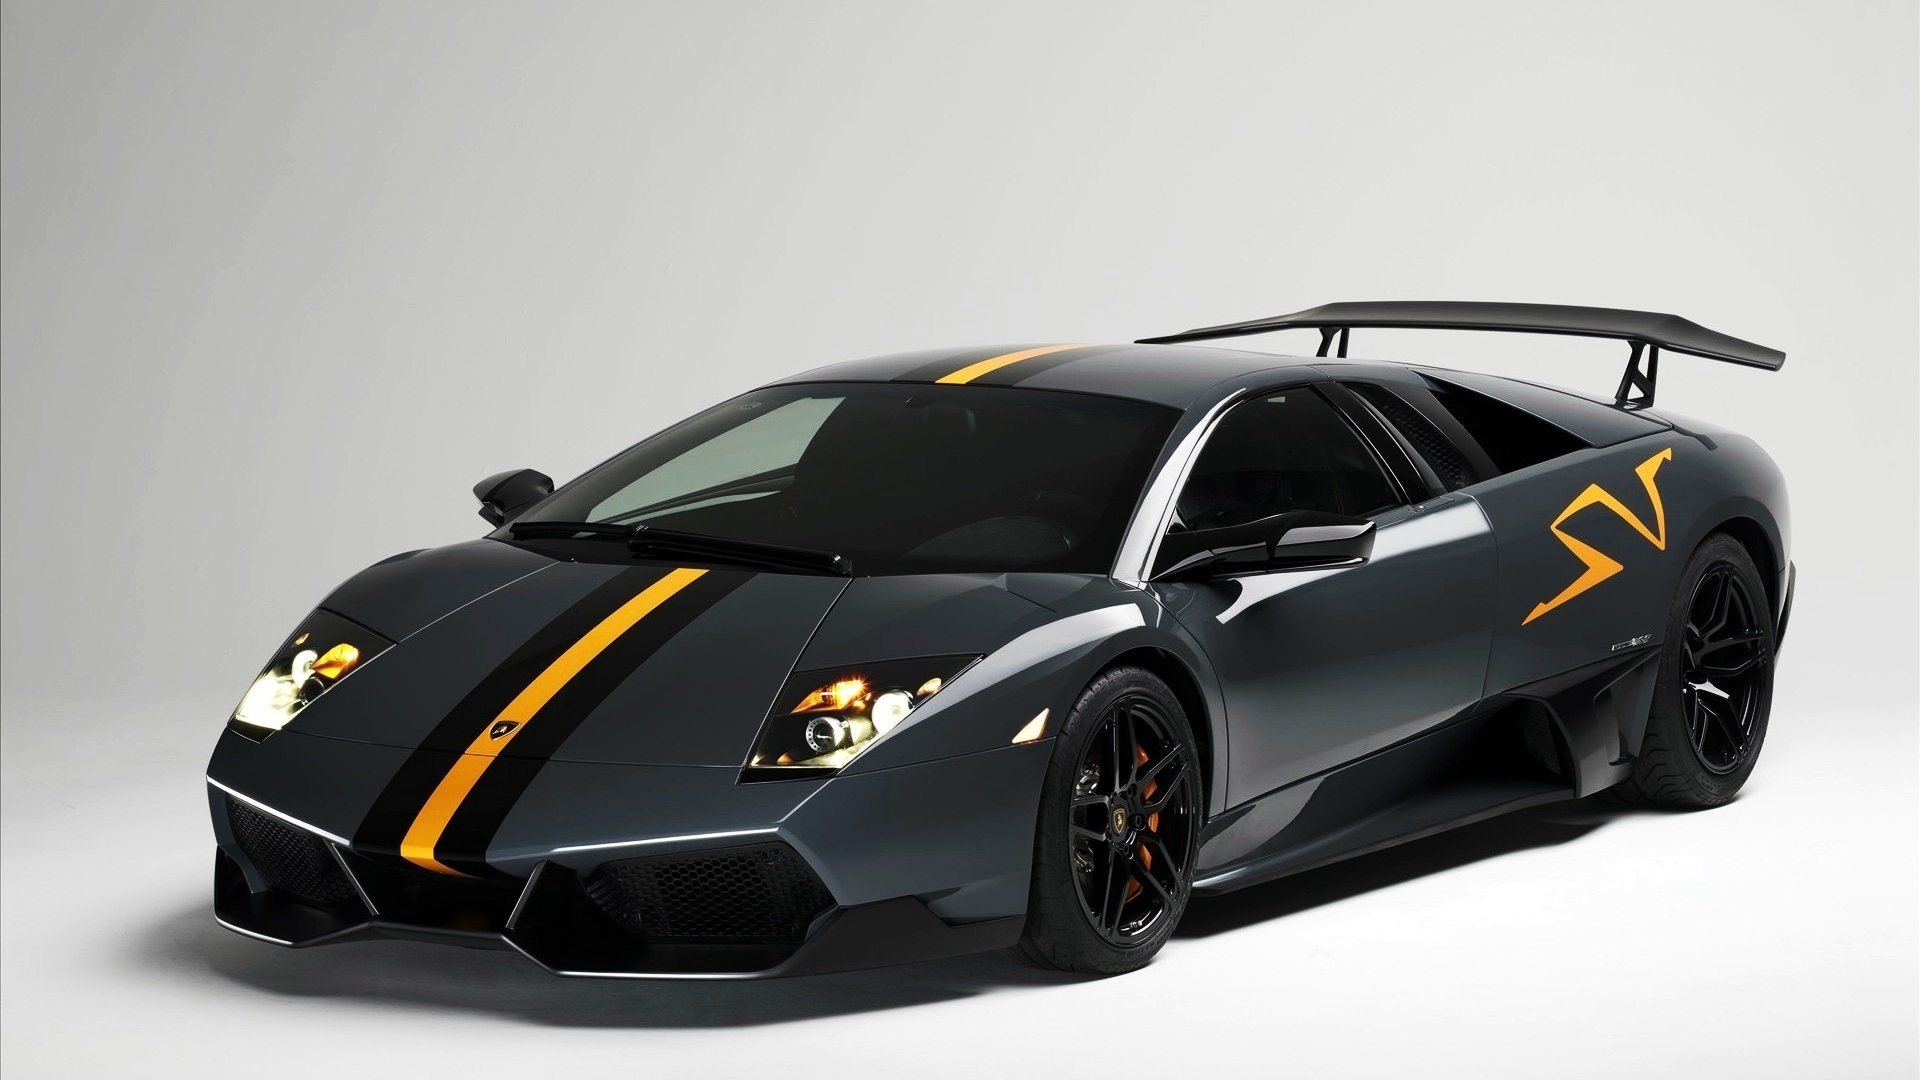 Lovely Free Download Lamborghini Murcielago Wallpaper ID:155318 Hd 1080p For  Desktop